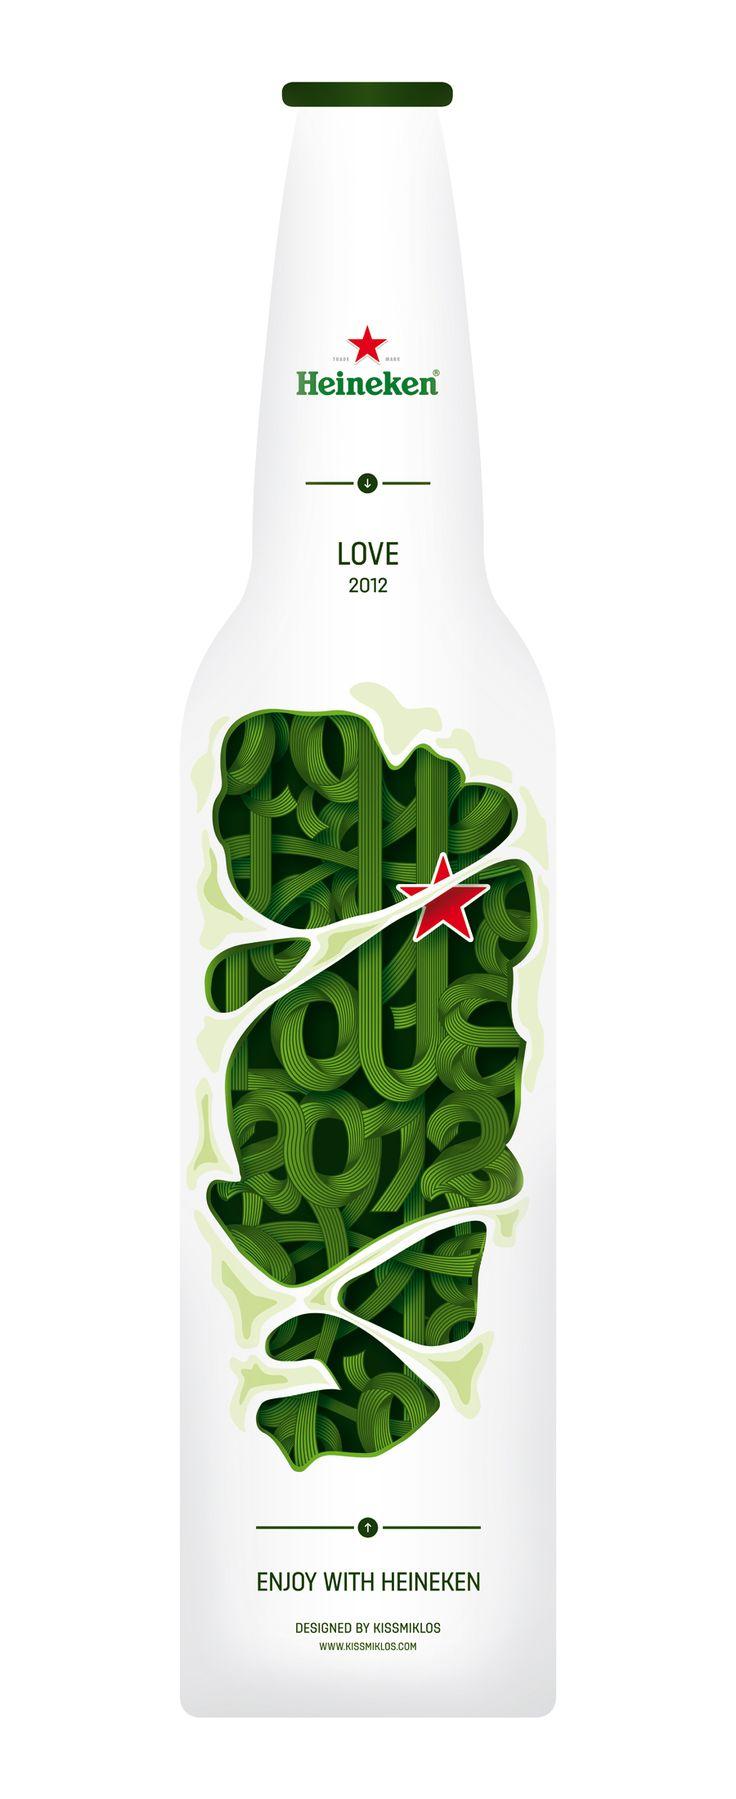 Heineken bottle concept | Designer:: Heineken Bottle, Beer Packaging, Bottle Packaging, Beer Bottle, Packaging Design Inspiration, Design Concept, Beer Design, Behance Network, Bottle Design